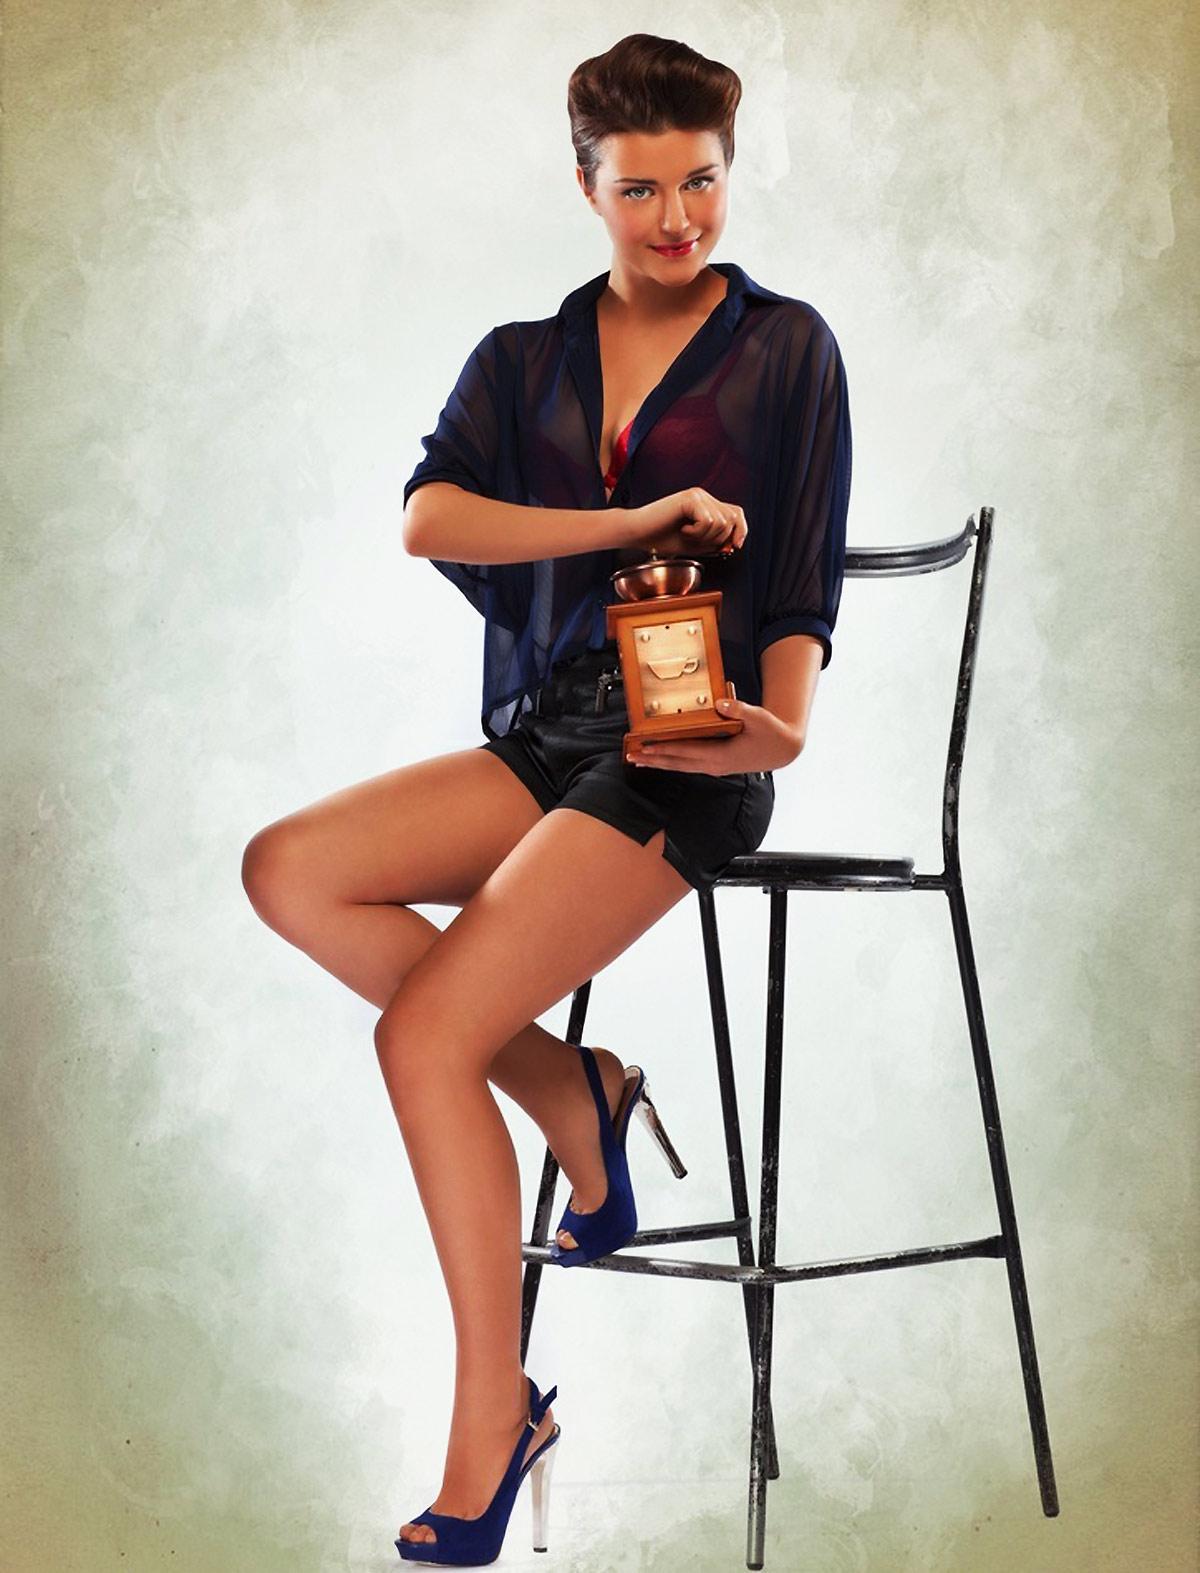 мирослава rambler знакомства секс катя фото